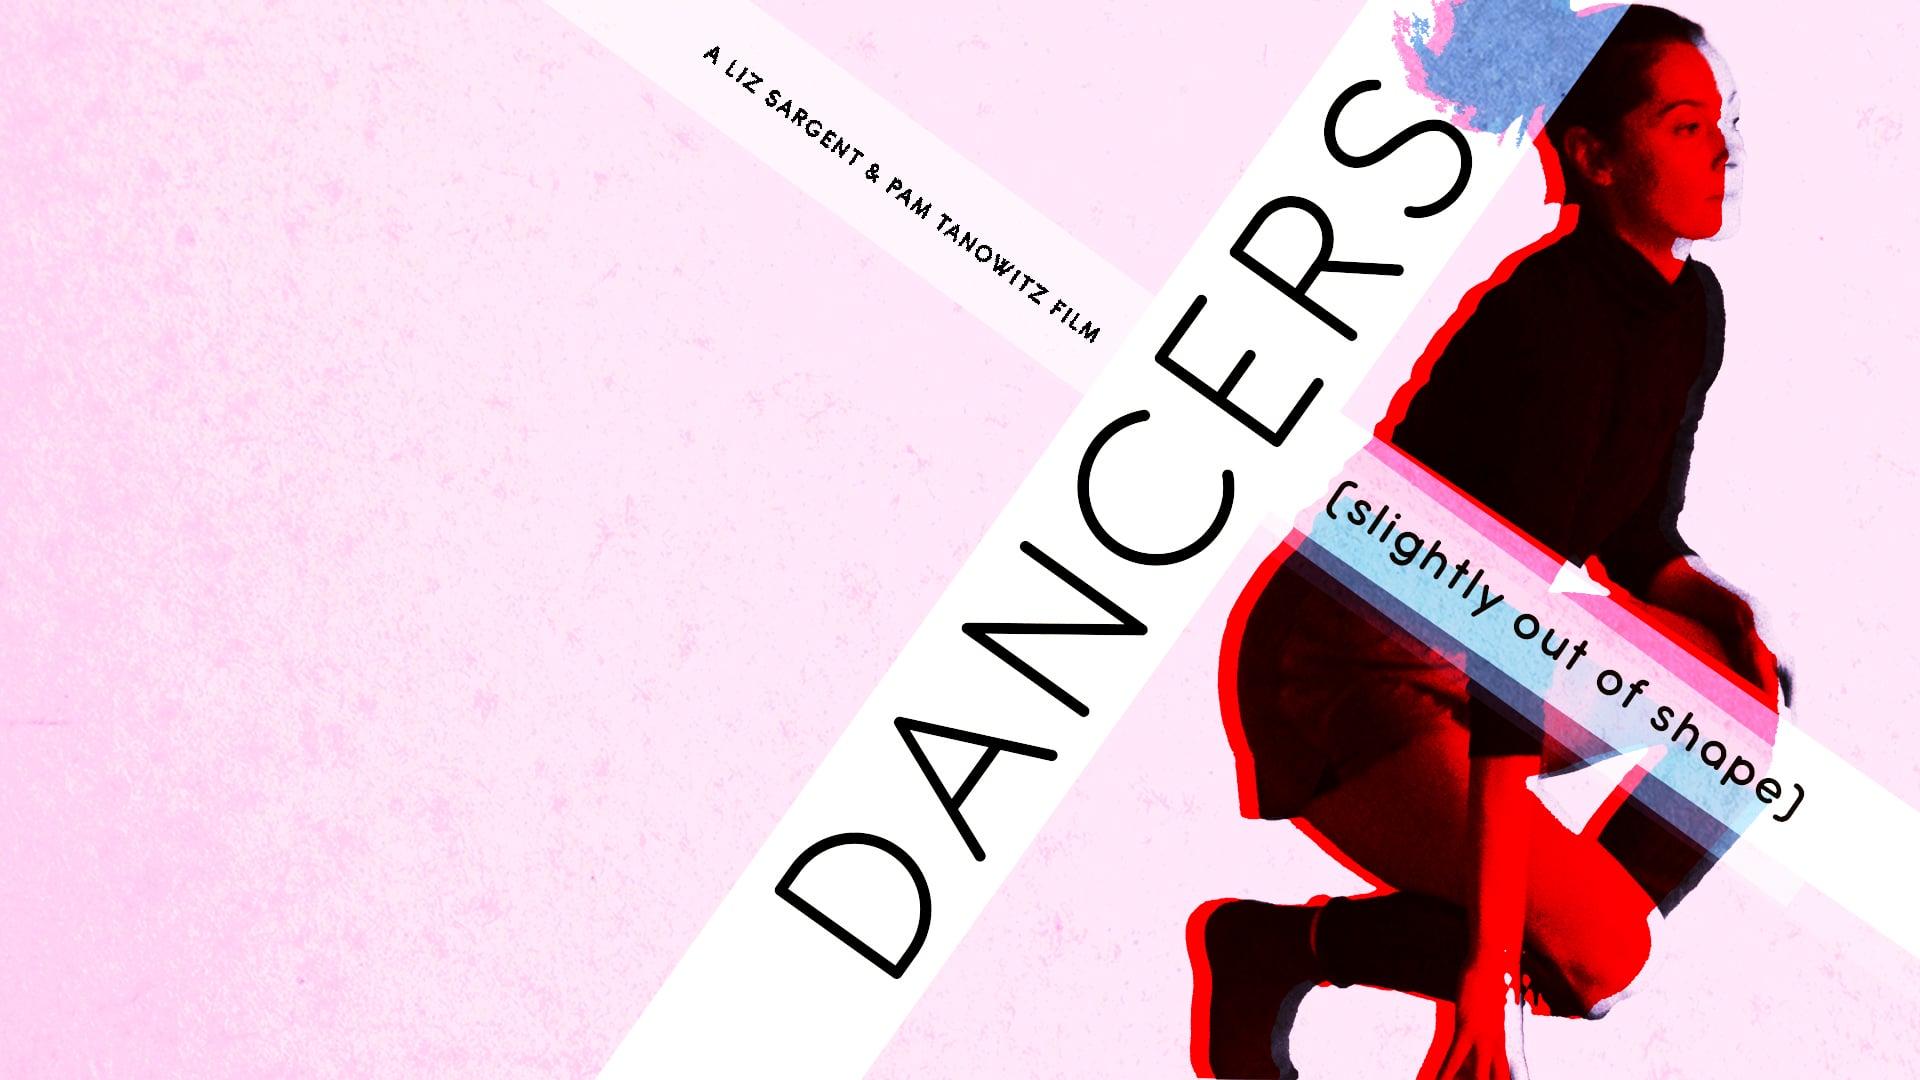 DANCERS (slightly out of shape) • TRAILER